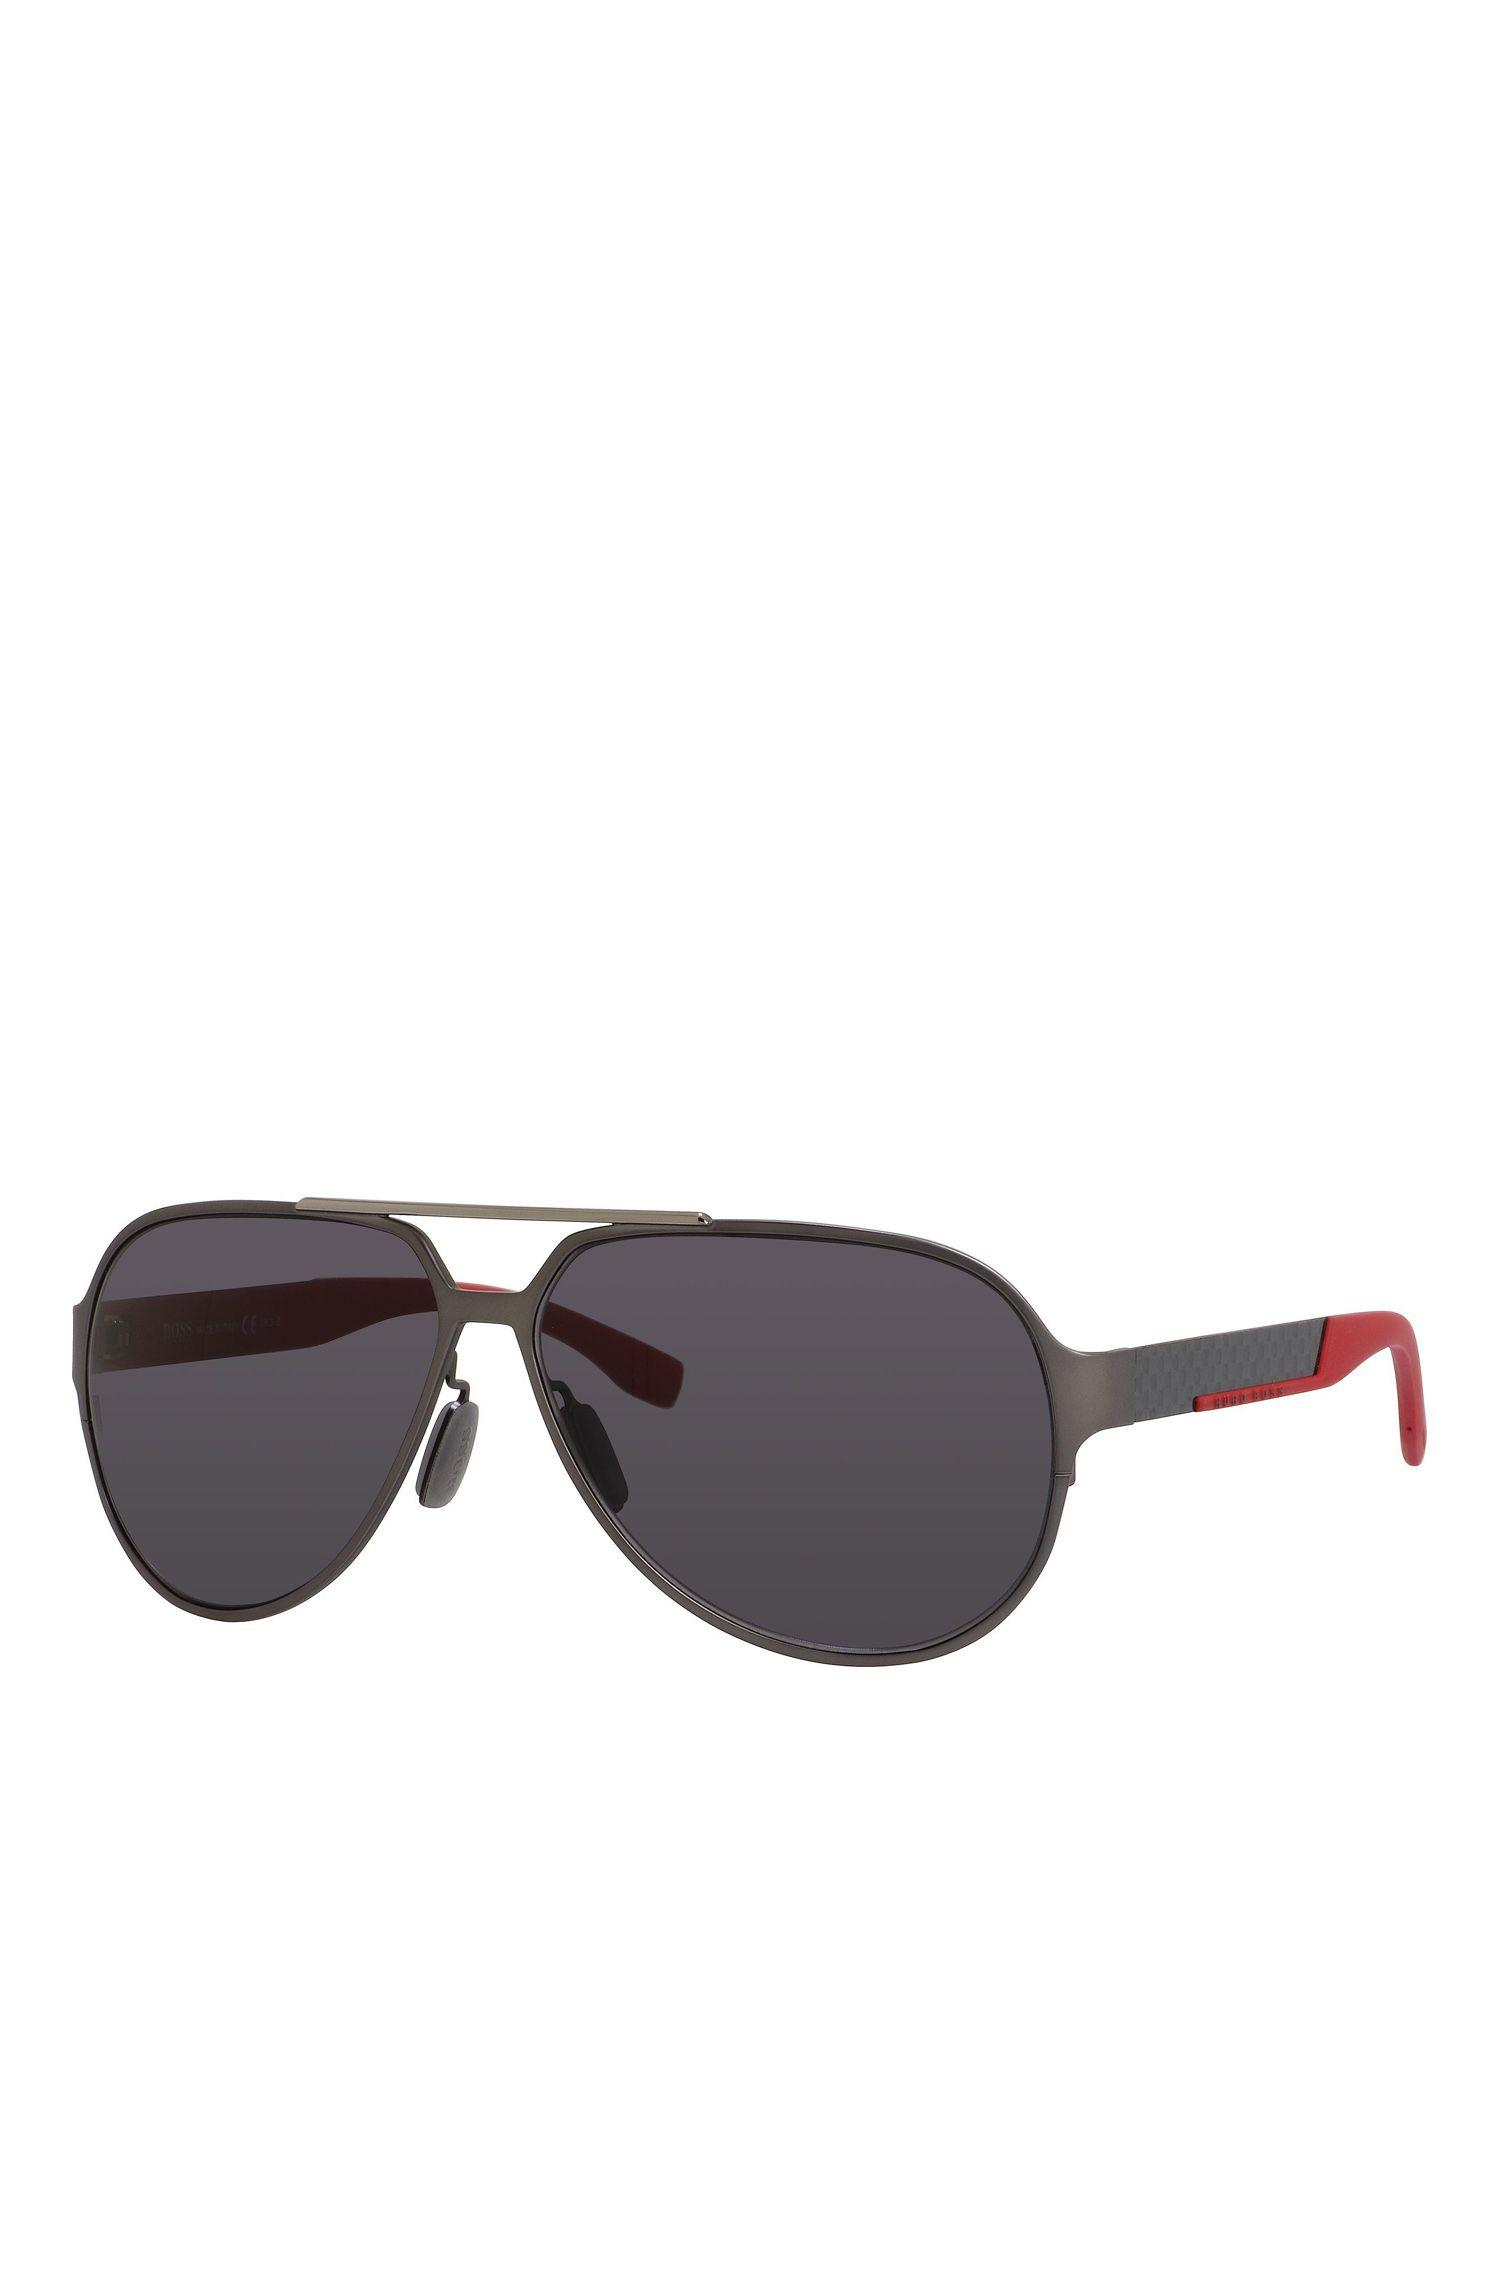 'BOSS  0669S'   Black Lens Carbon Fiber Aviator Sunglasses